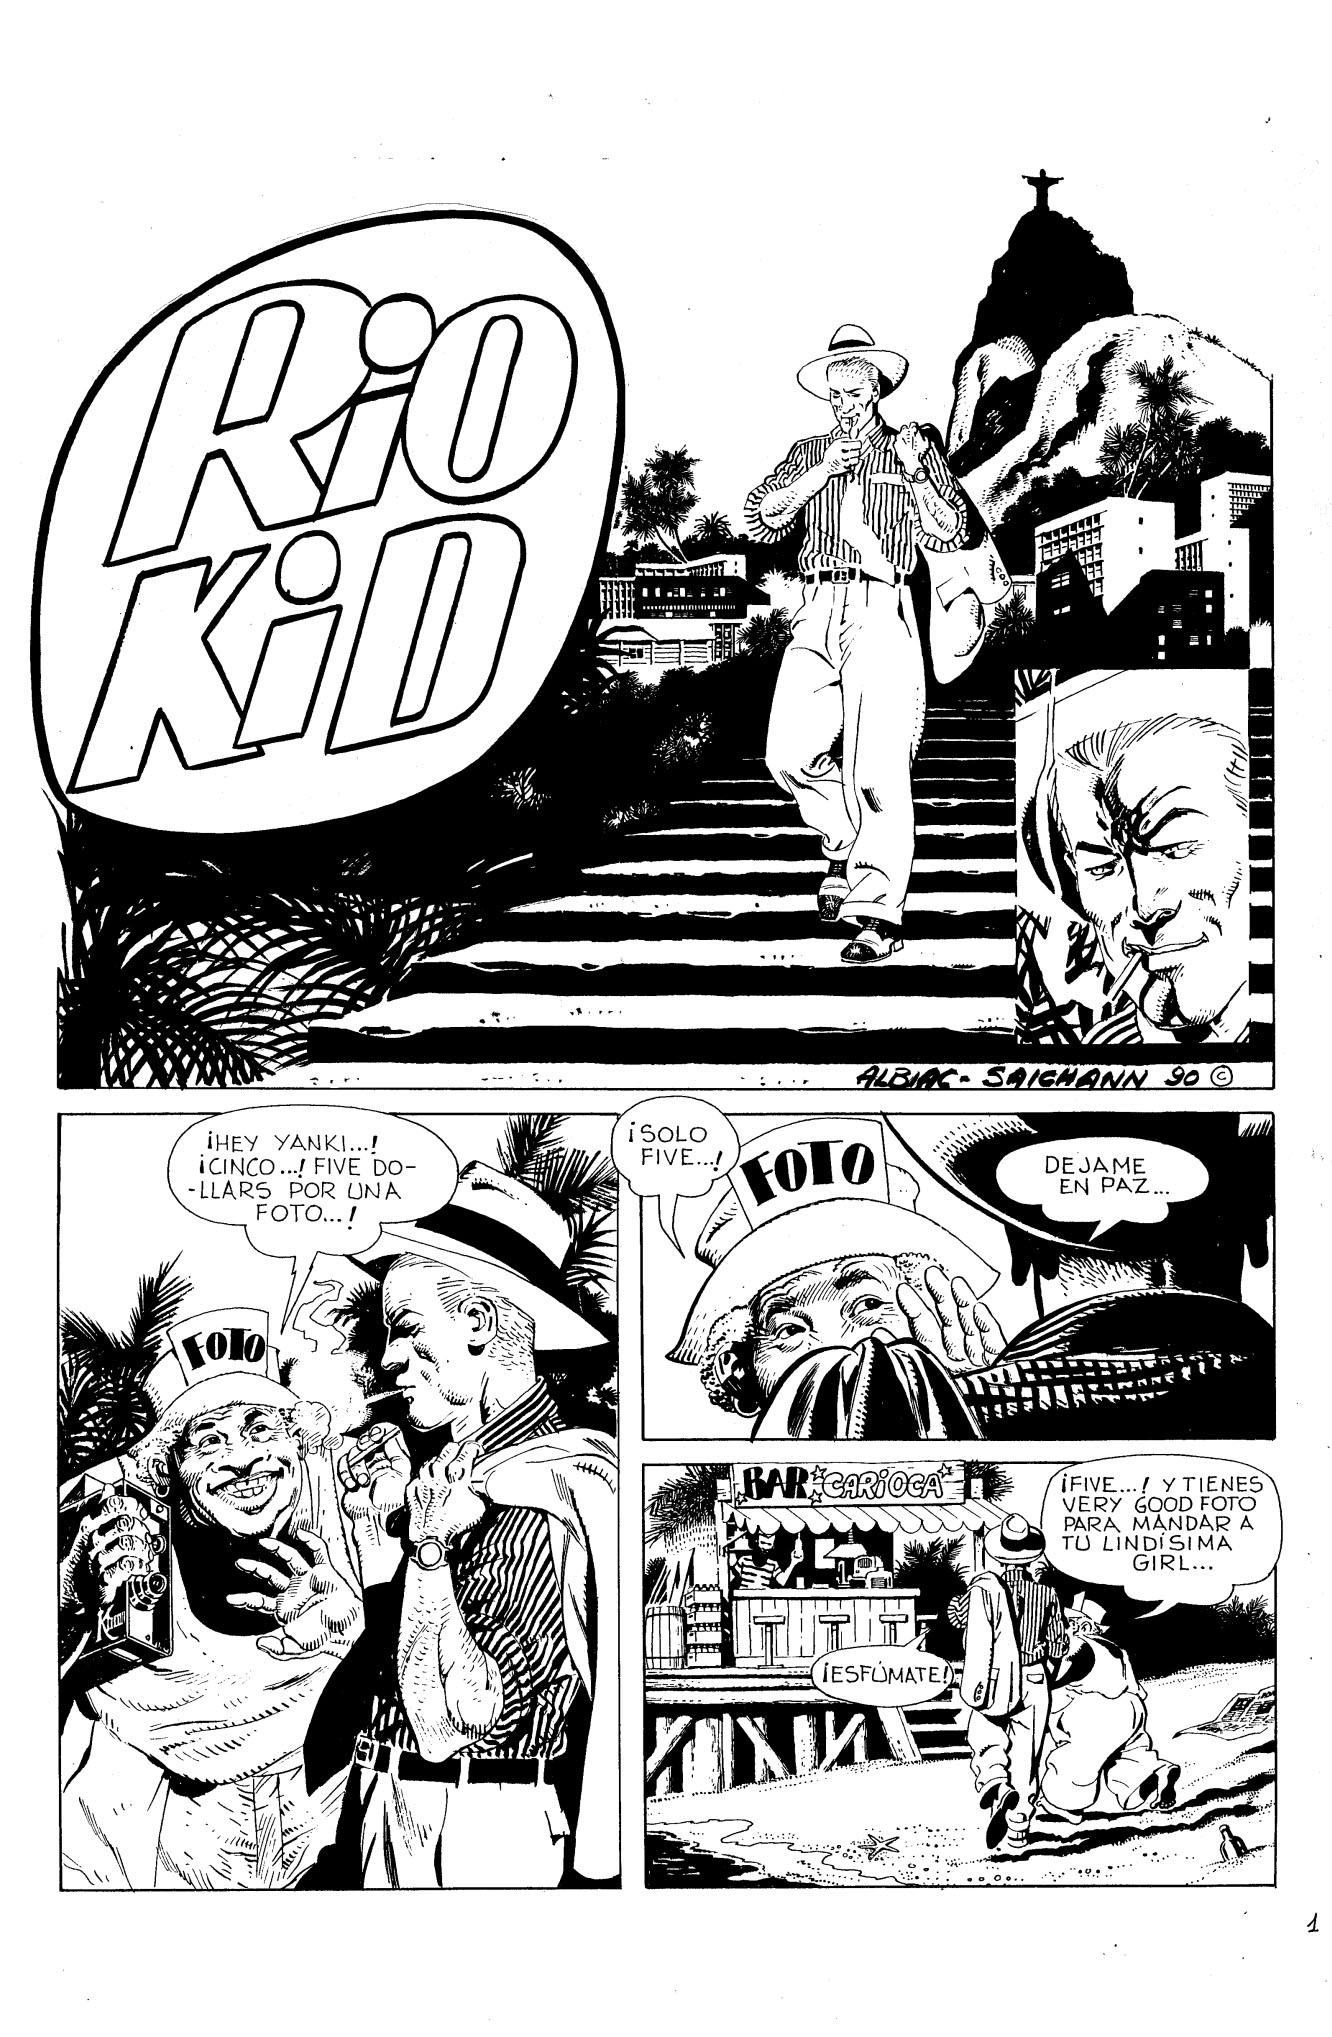 RioKid-01